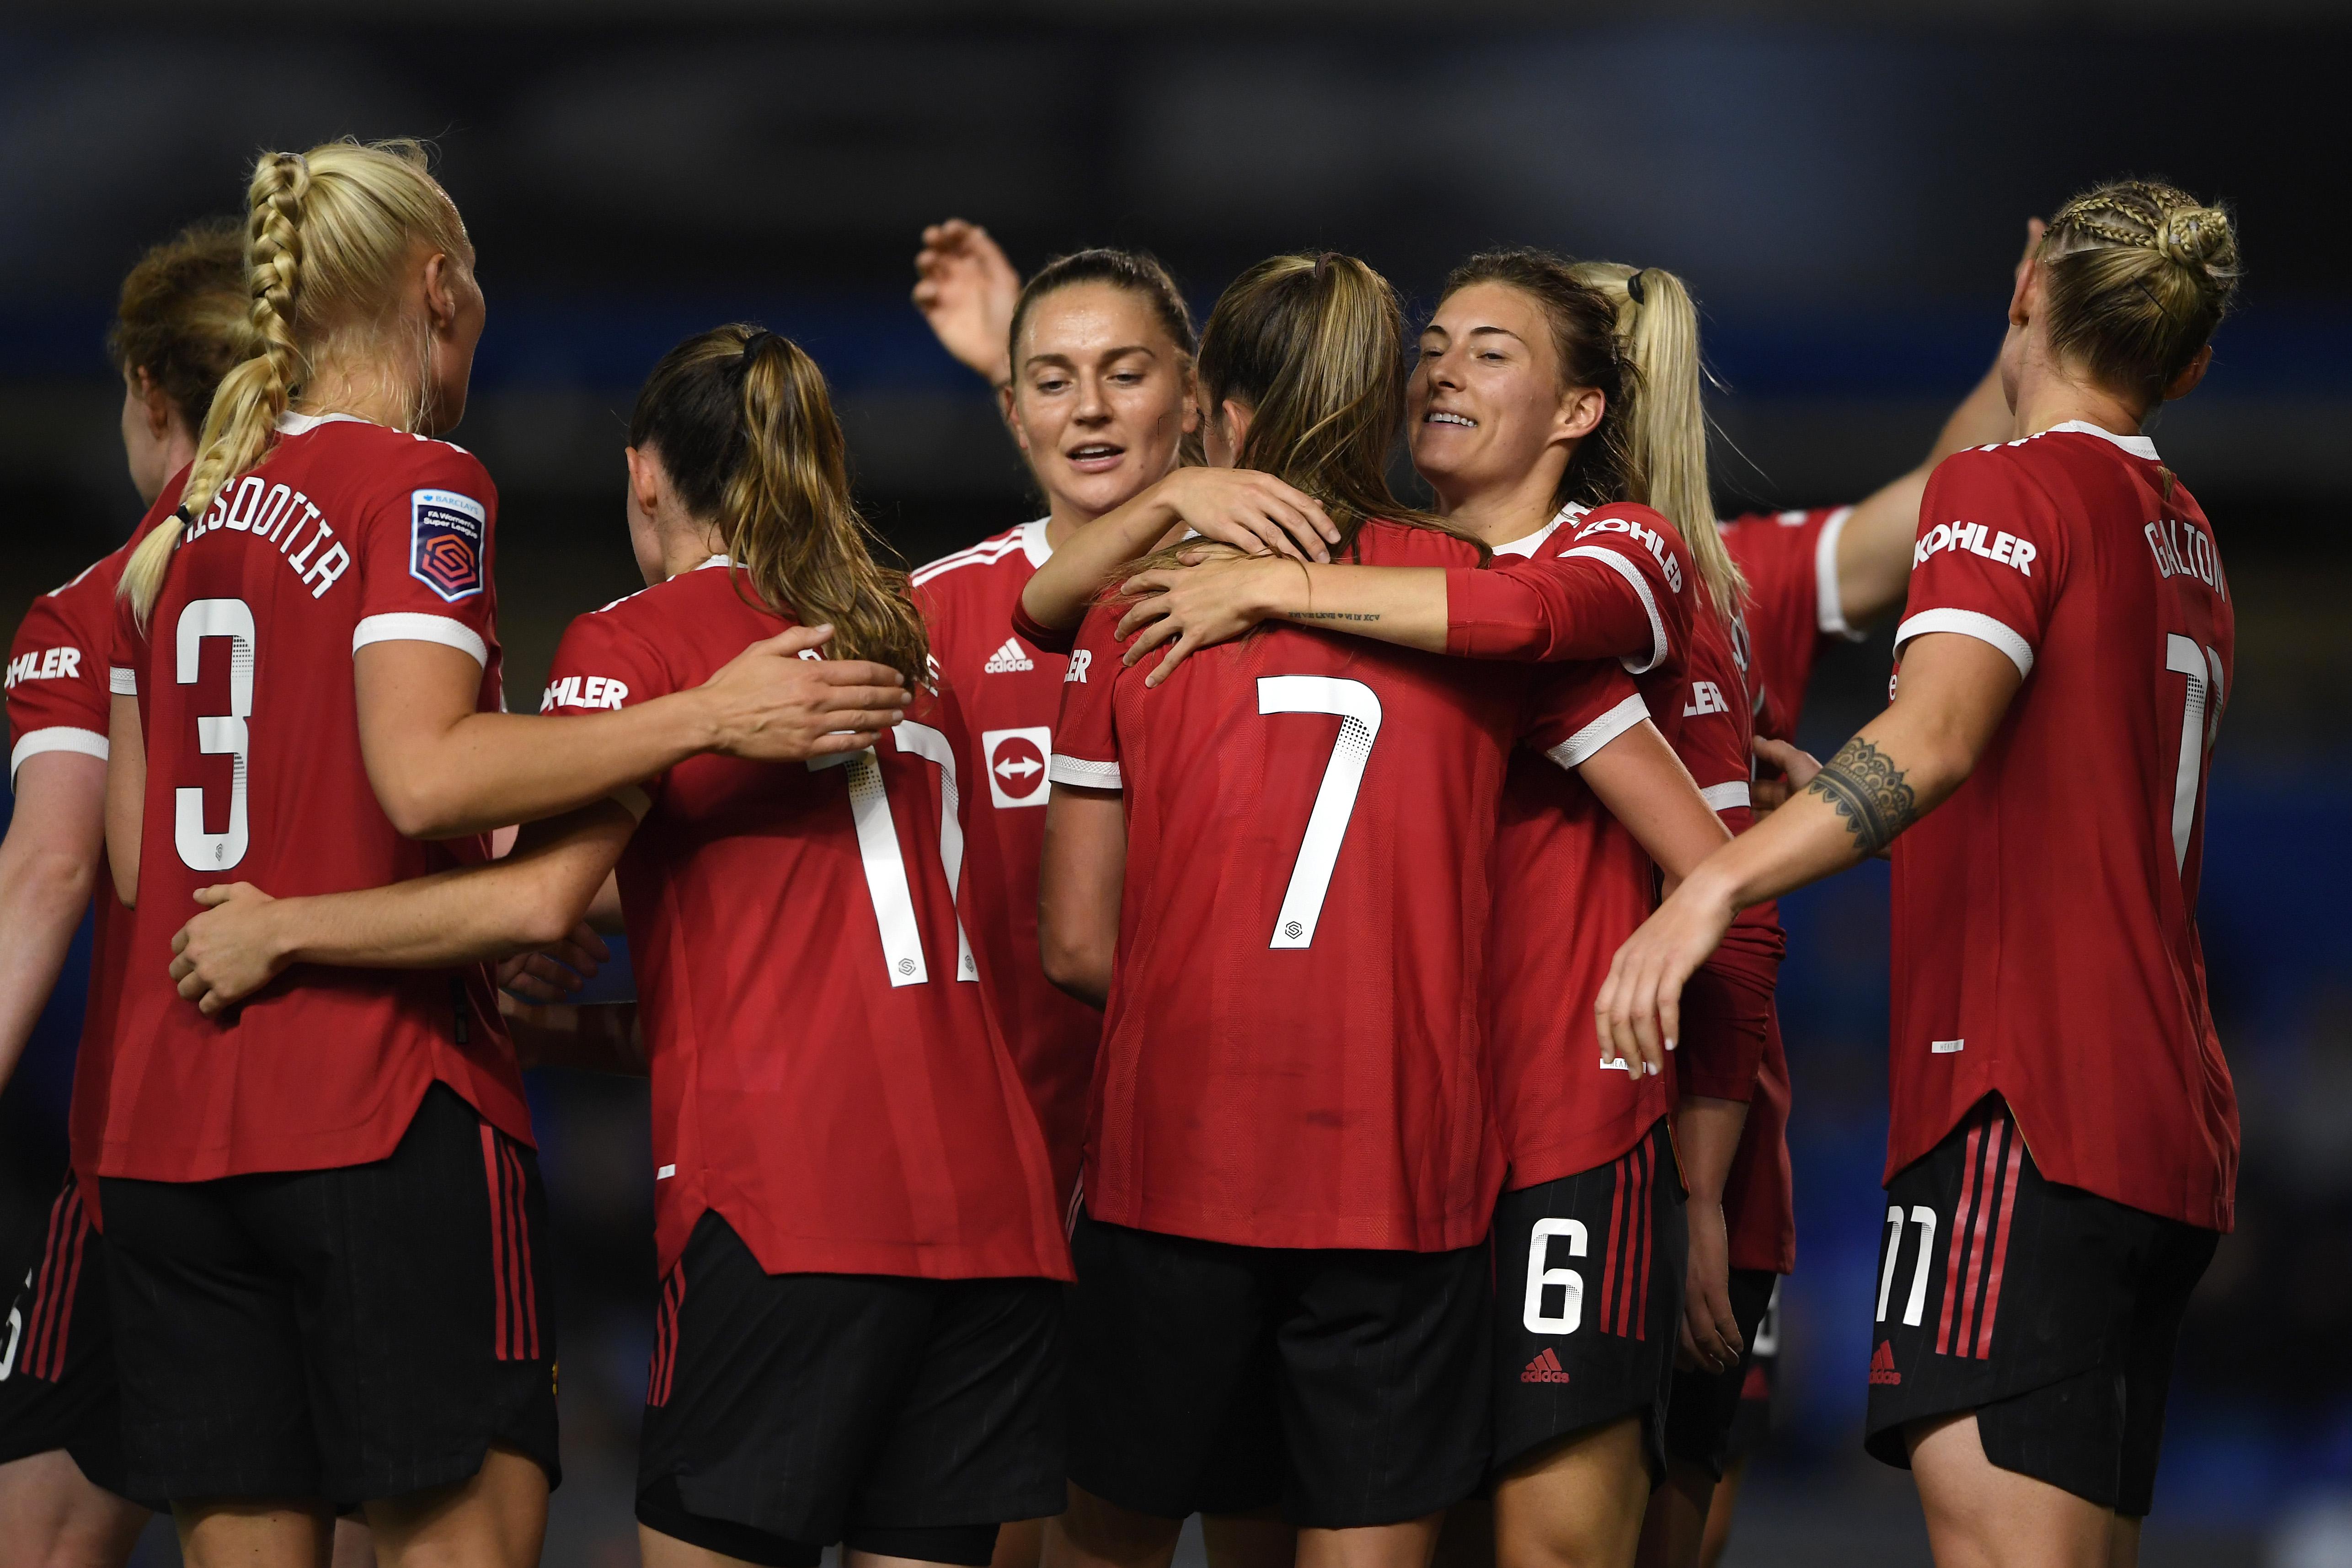 Birmingham City Women v Manchester United Women - Barclays FA Women's Super League